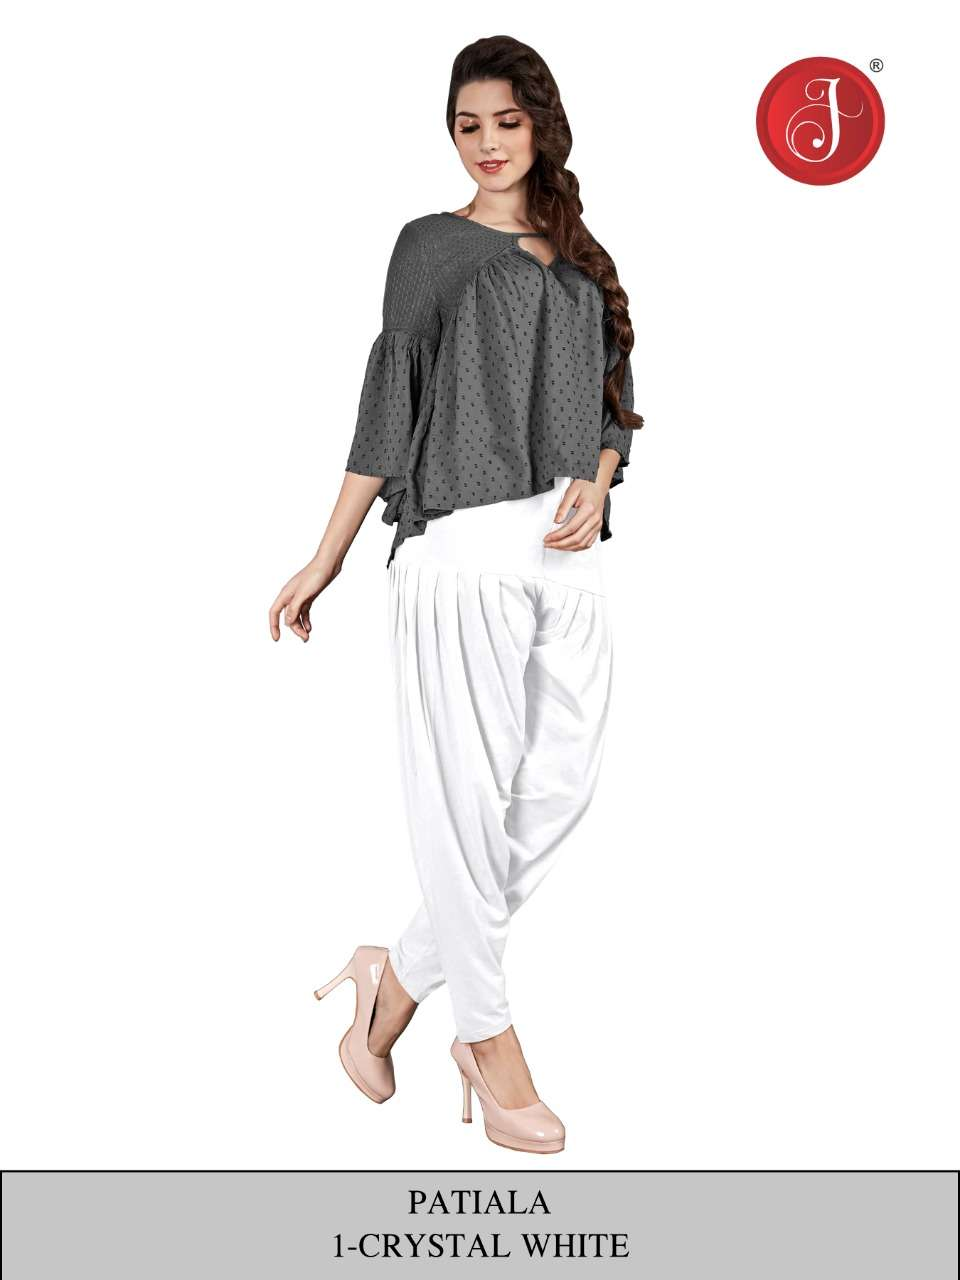 Patiala By Jelite Cotton Stretchable Wonderful Fitting Patiala Bottom Online Exporter